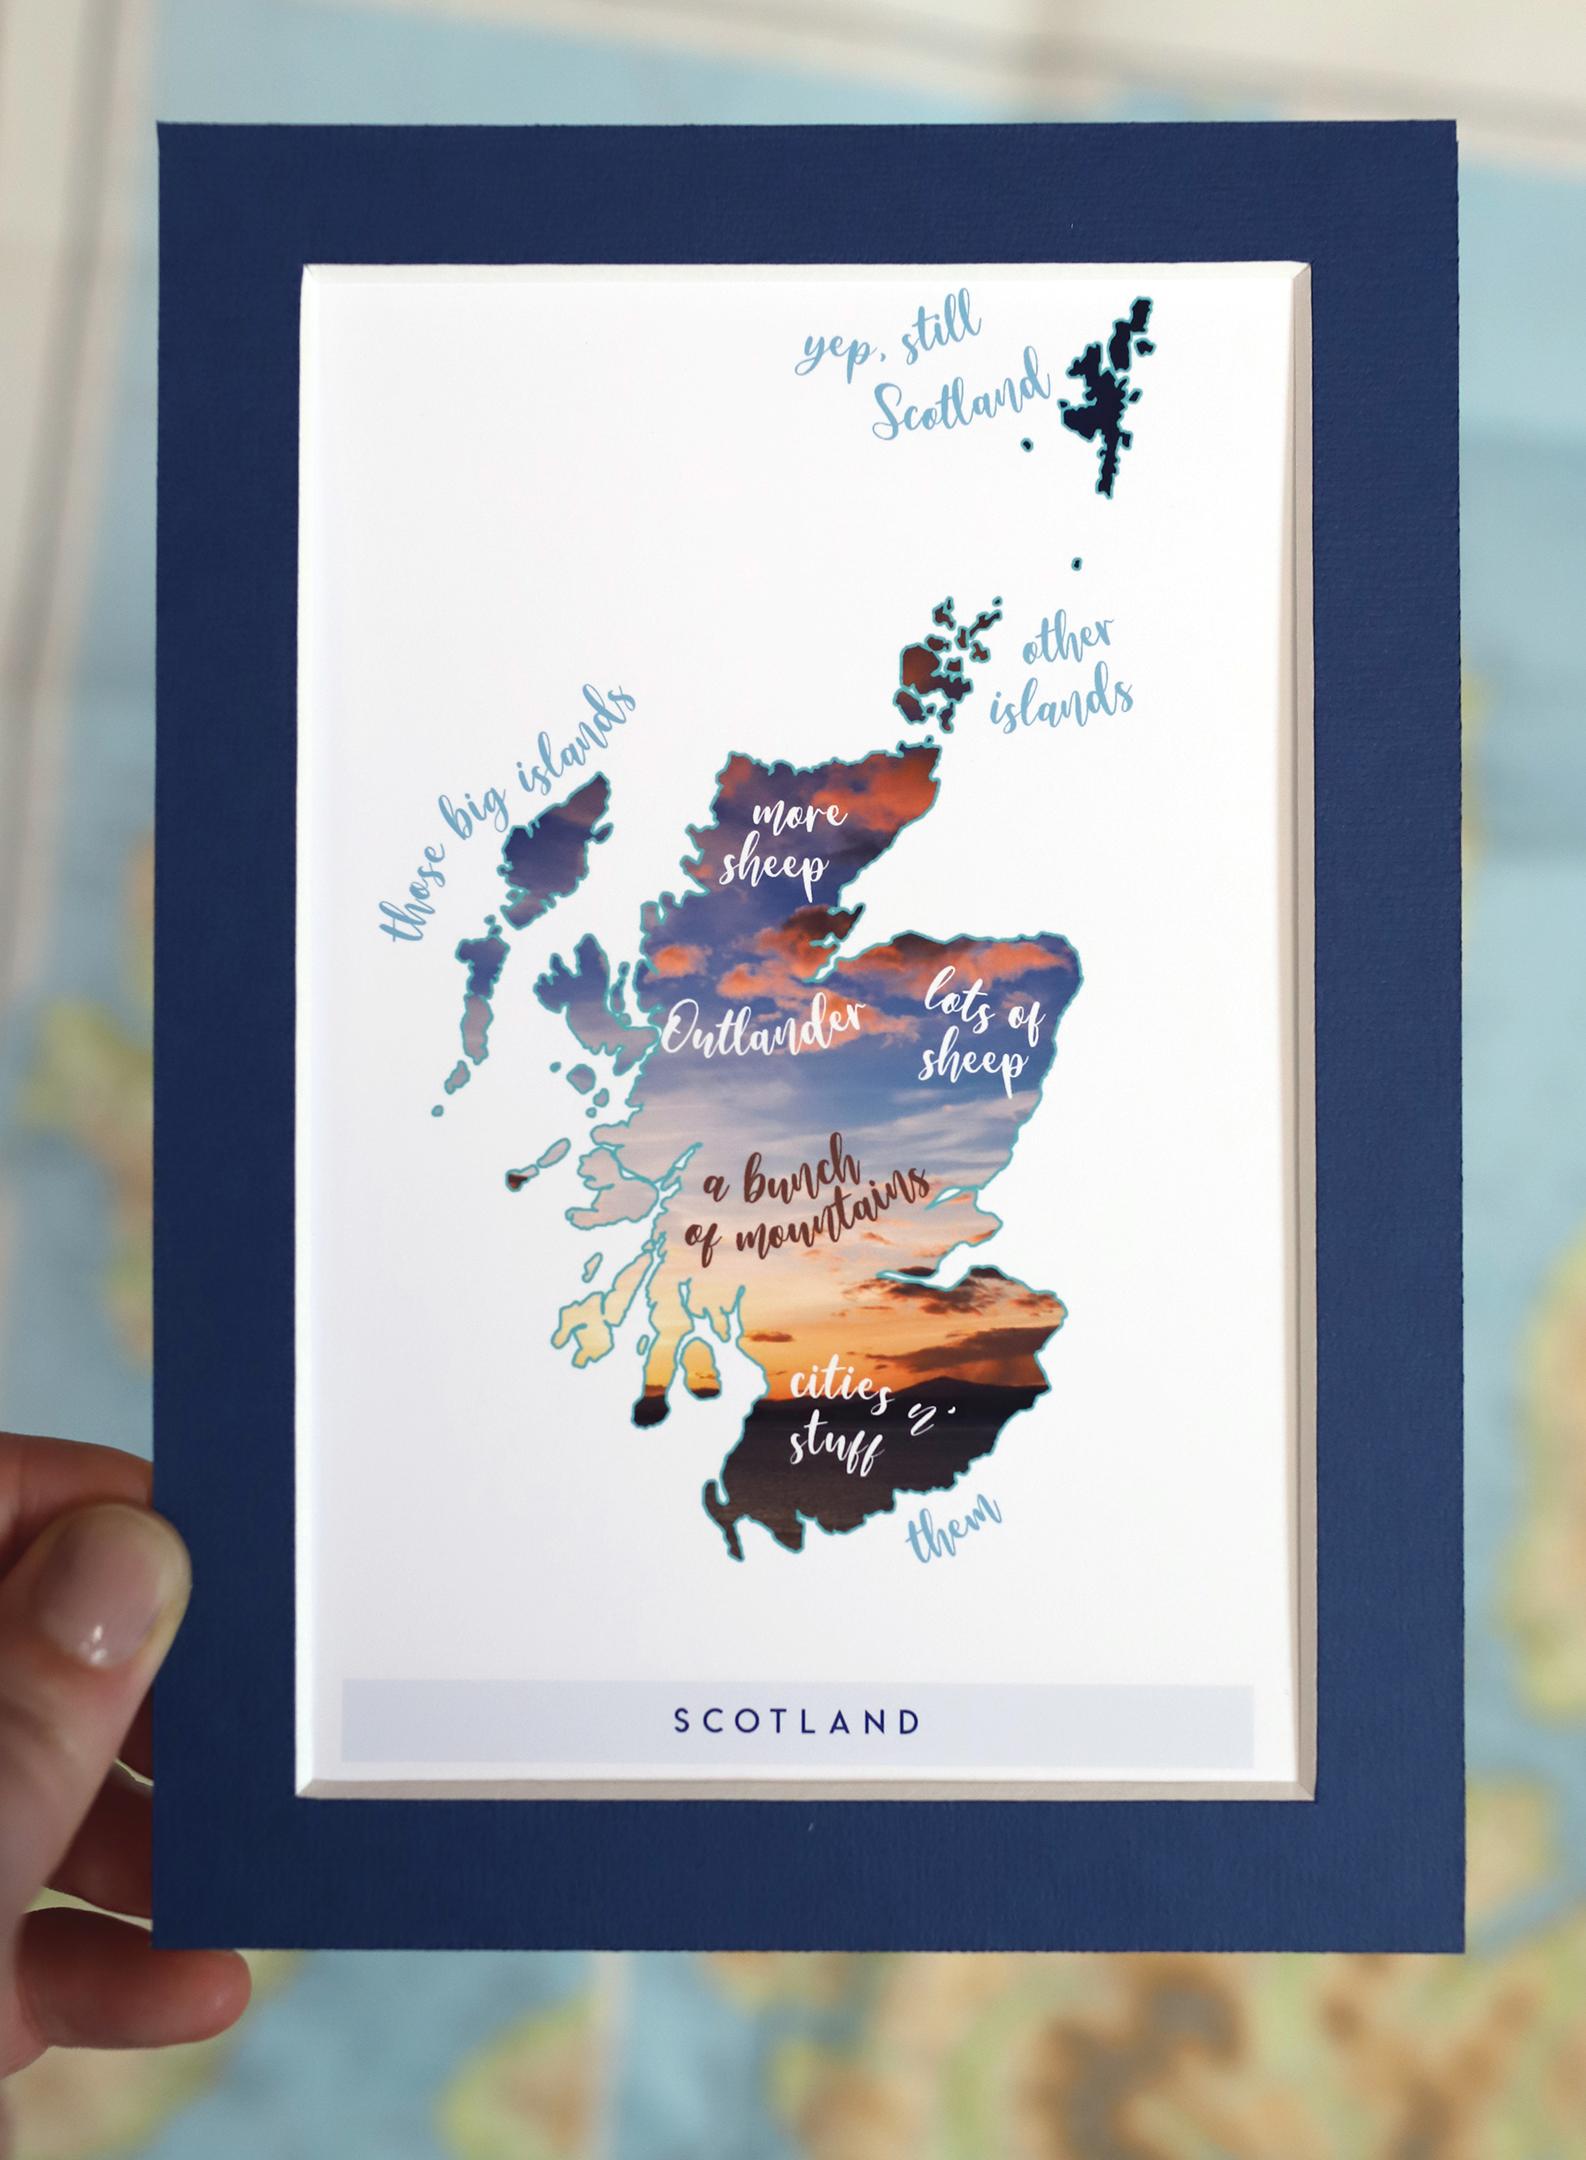 Scotland Map_Funny_001.jpg